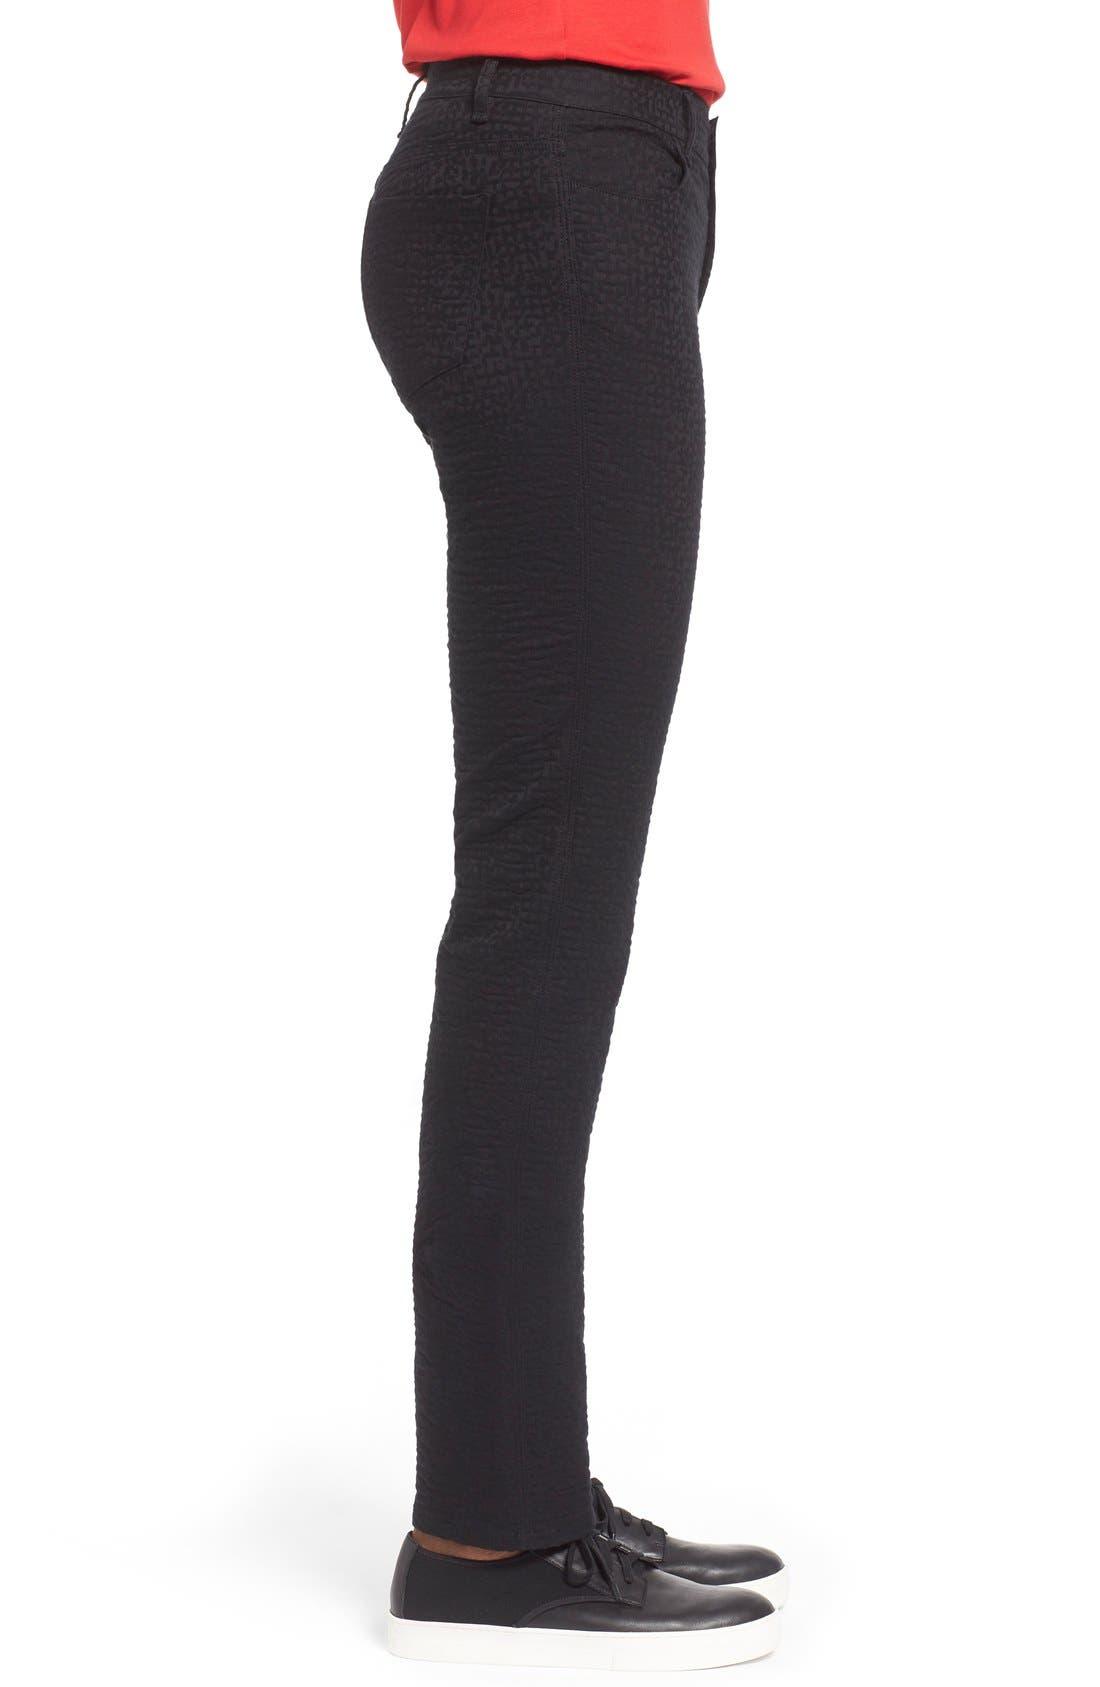 Alternate Image 3  - Lafayette 148 New York Curvy Fit Jacquard Stretch Slim Leg Jeans (Black) (Regular & Petite)